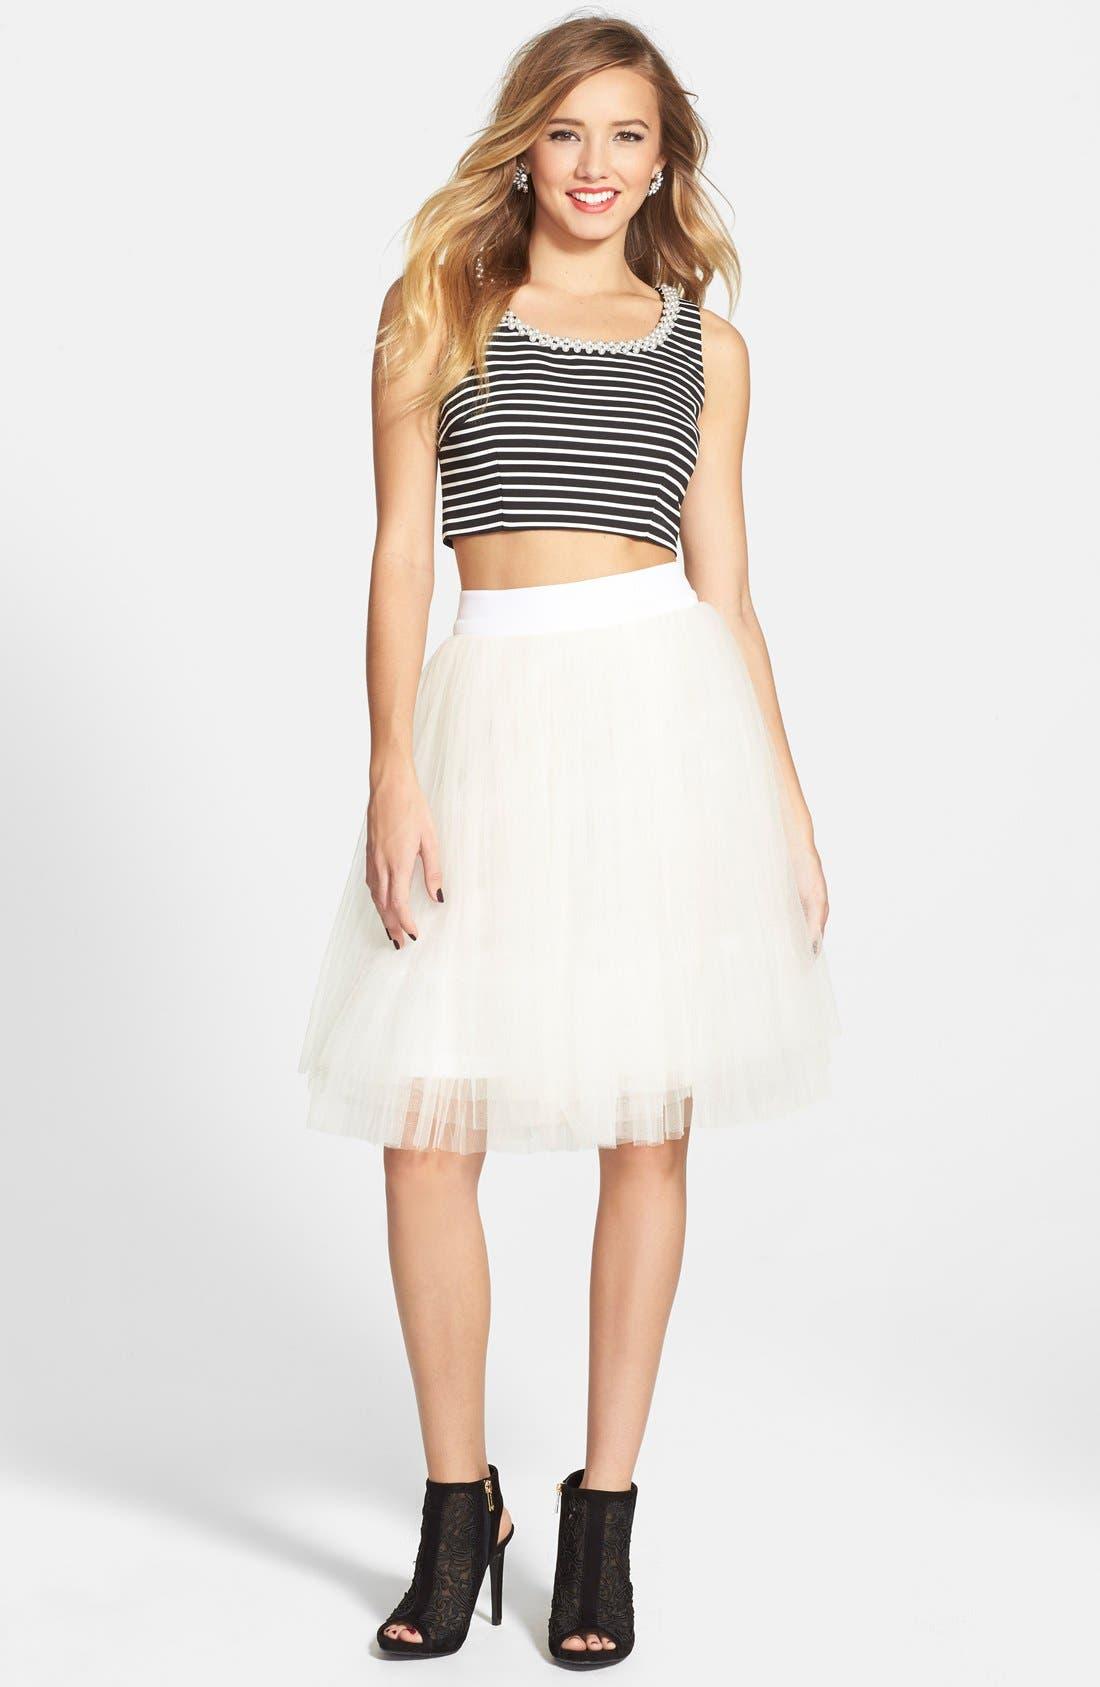 Alternate Image 1 Selected - a. drea Embellished Two-Piece Ballerina Dress (Juniors)